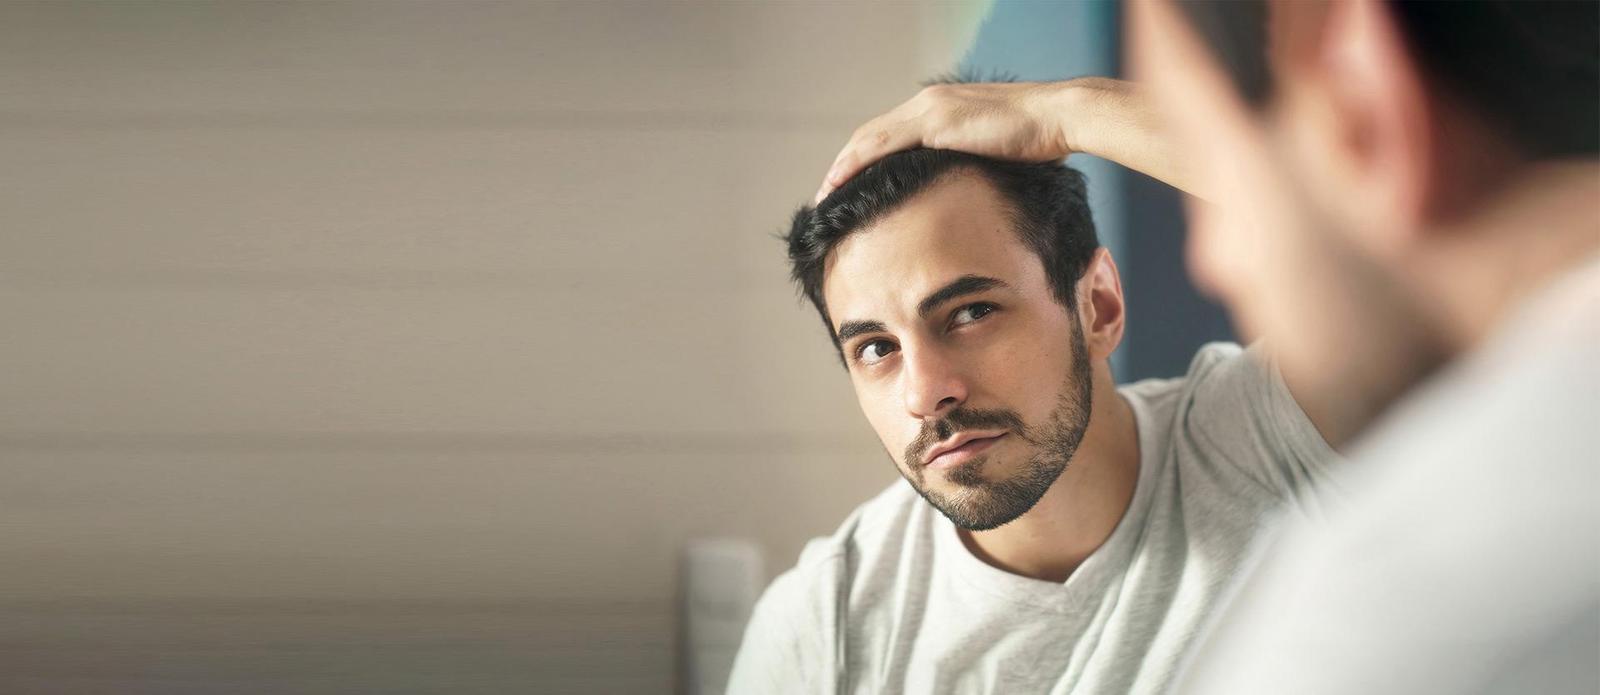 How Did Hair Transplant Begin?